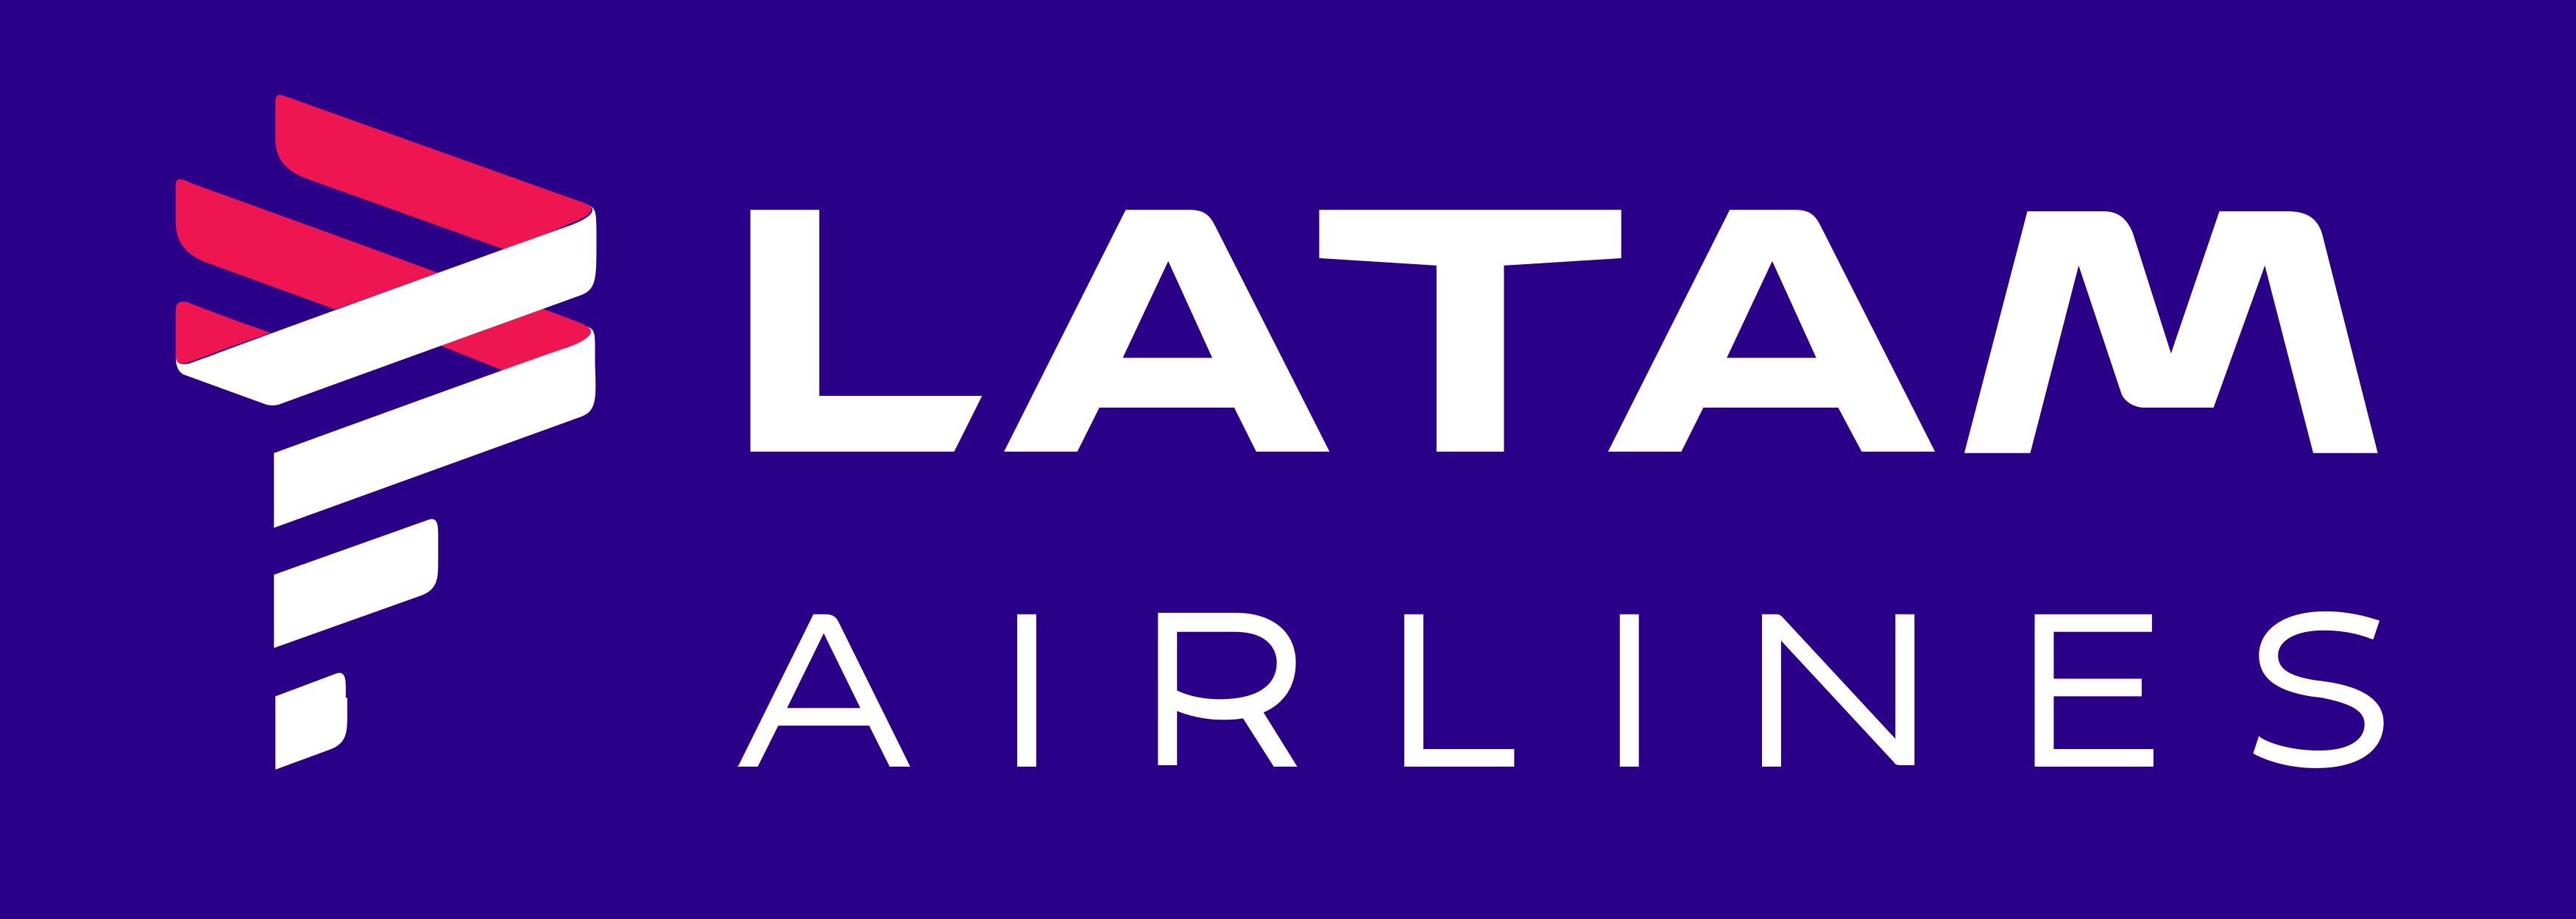 latam logo 1 - Latam Airlines Logo